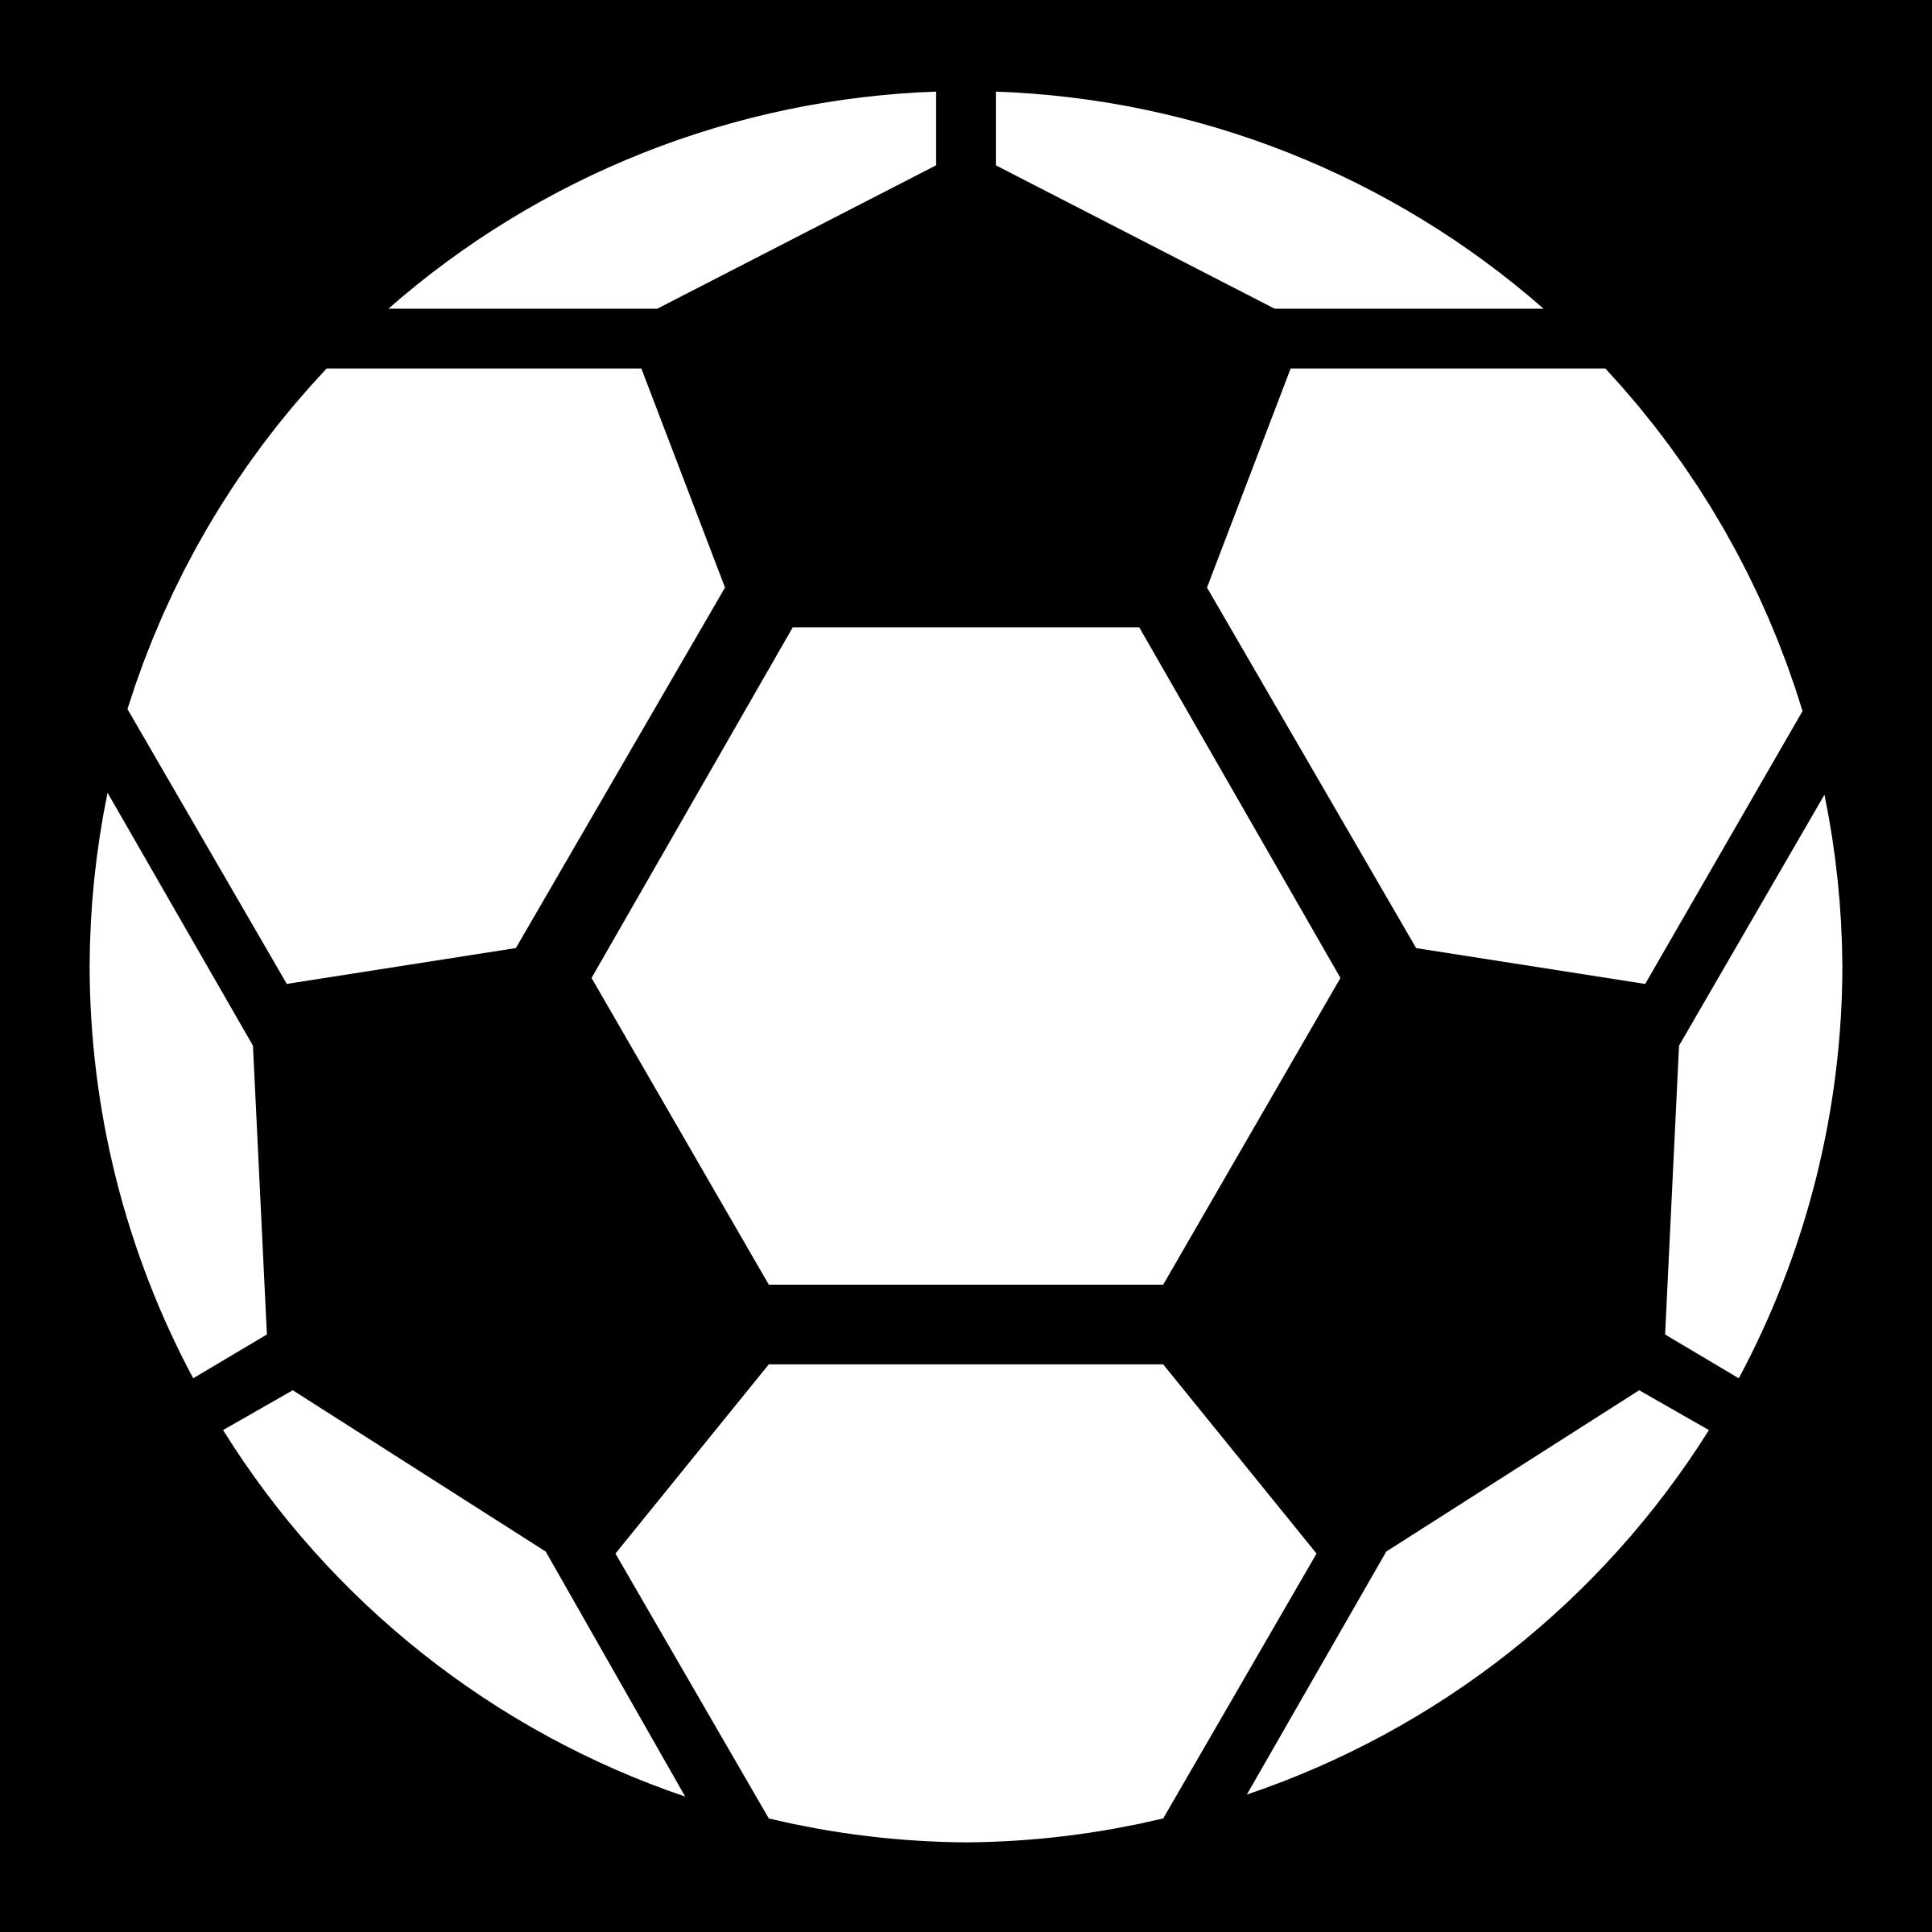 Soccer balls clipart tumundografico